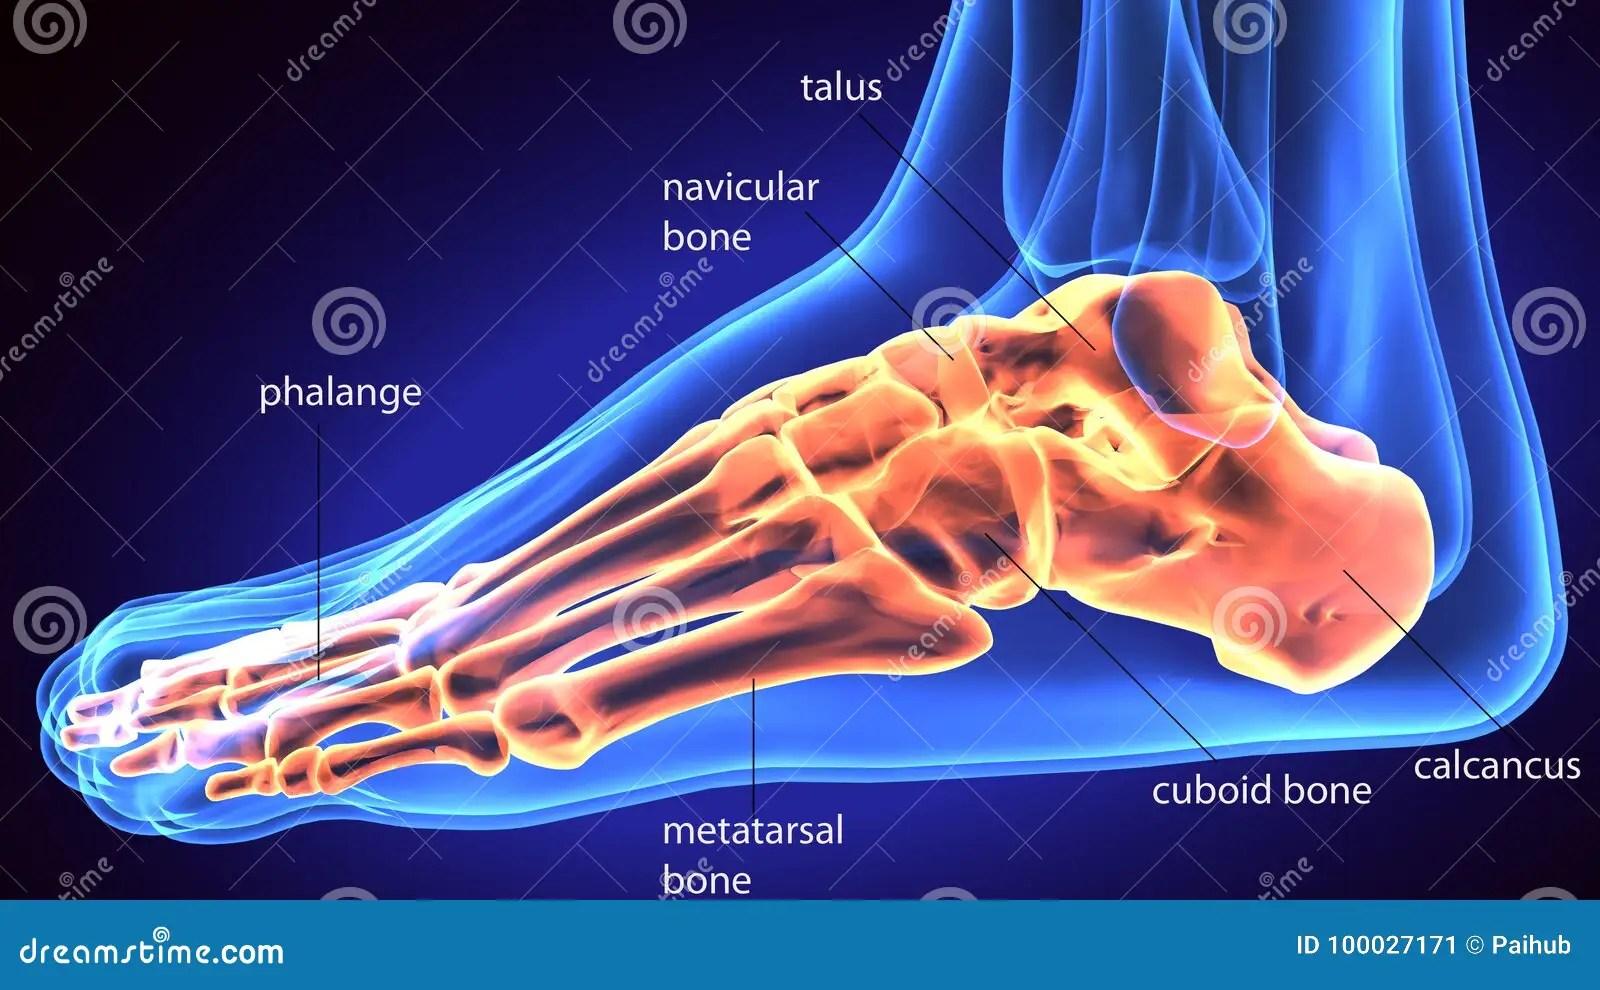 hight resolution of 3d rendering medical illustration of the feet bone